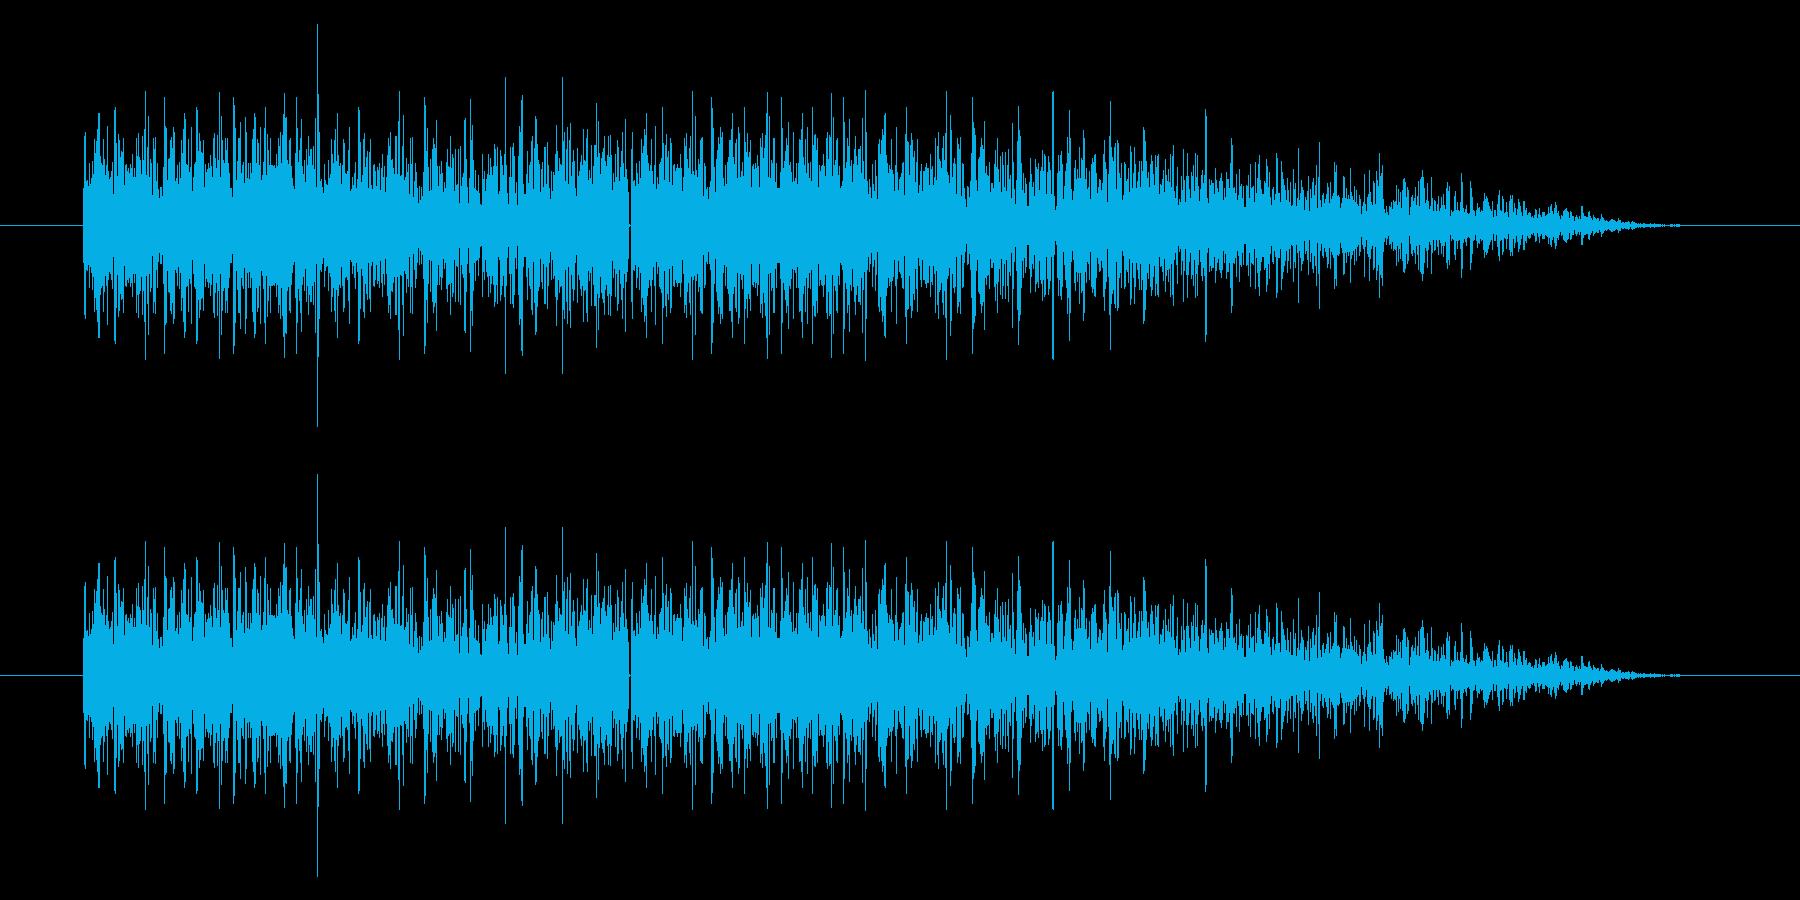 SNES-RPG04-04(魔法 炎3)の再生済みの波形